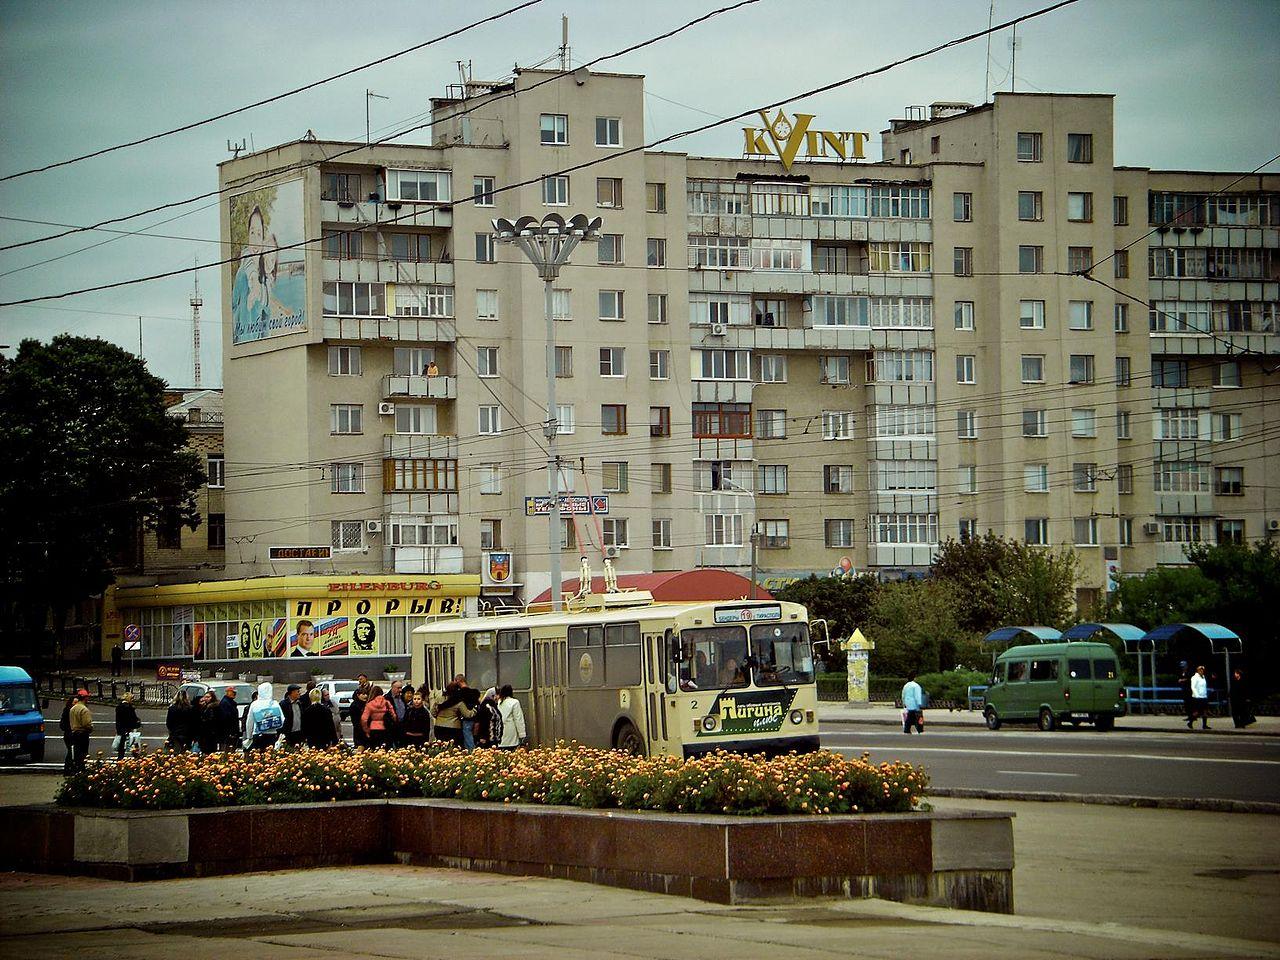 Tiraspol, Transnistria (foto Minamie's Photo)